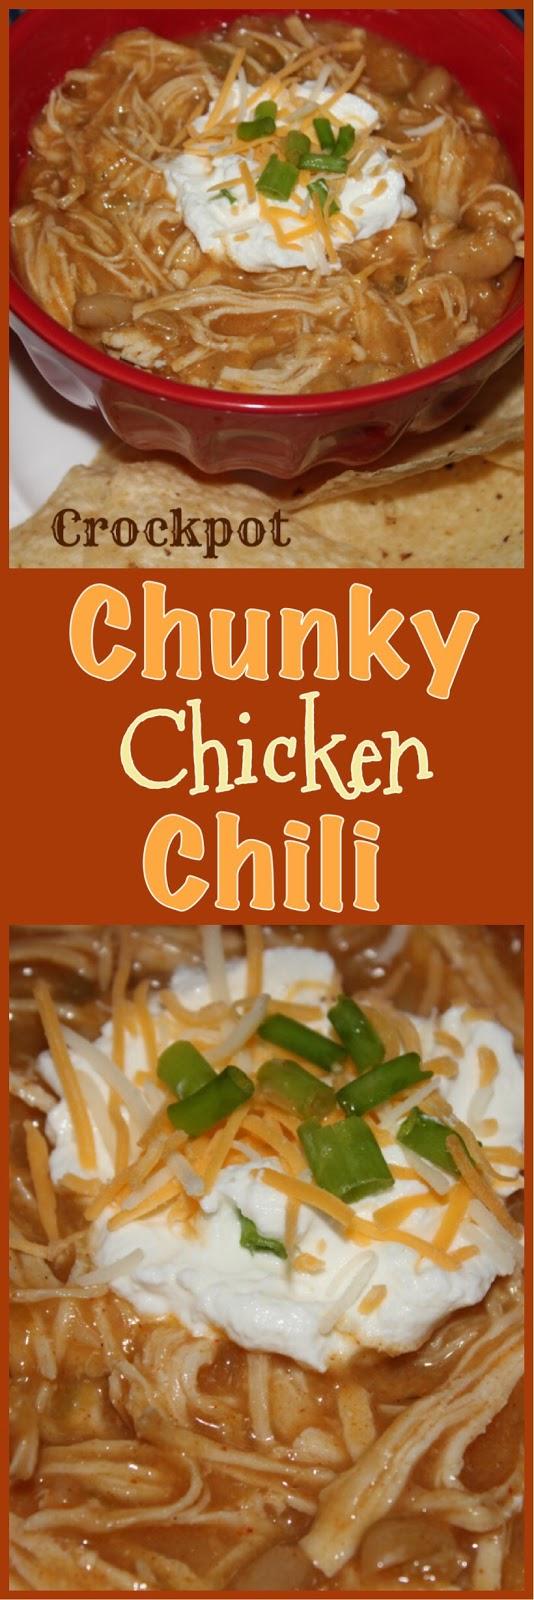 White Chicken Chili Crockpot Recipes Northern Beans